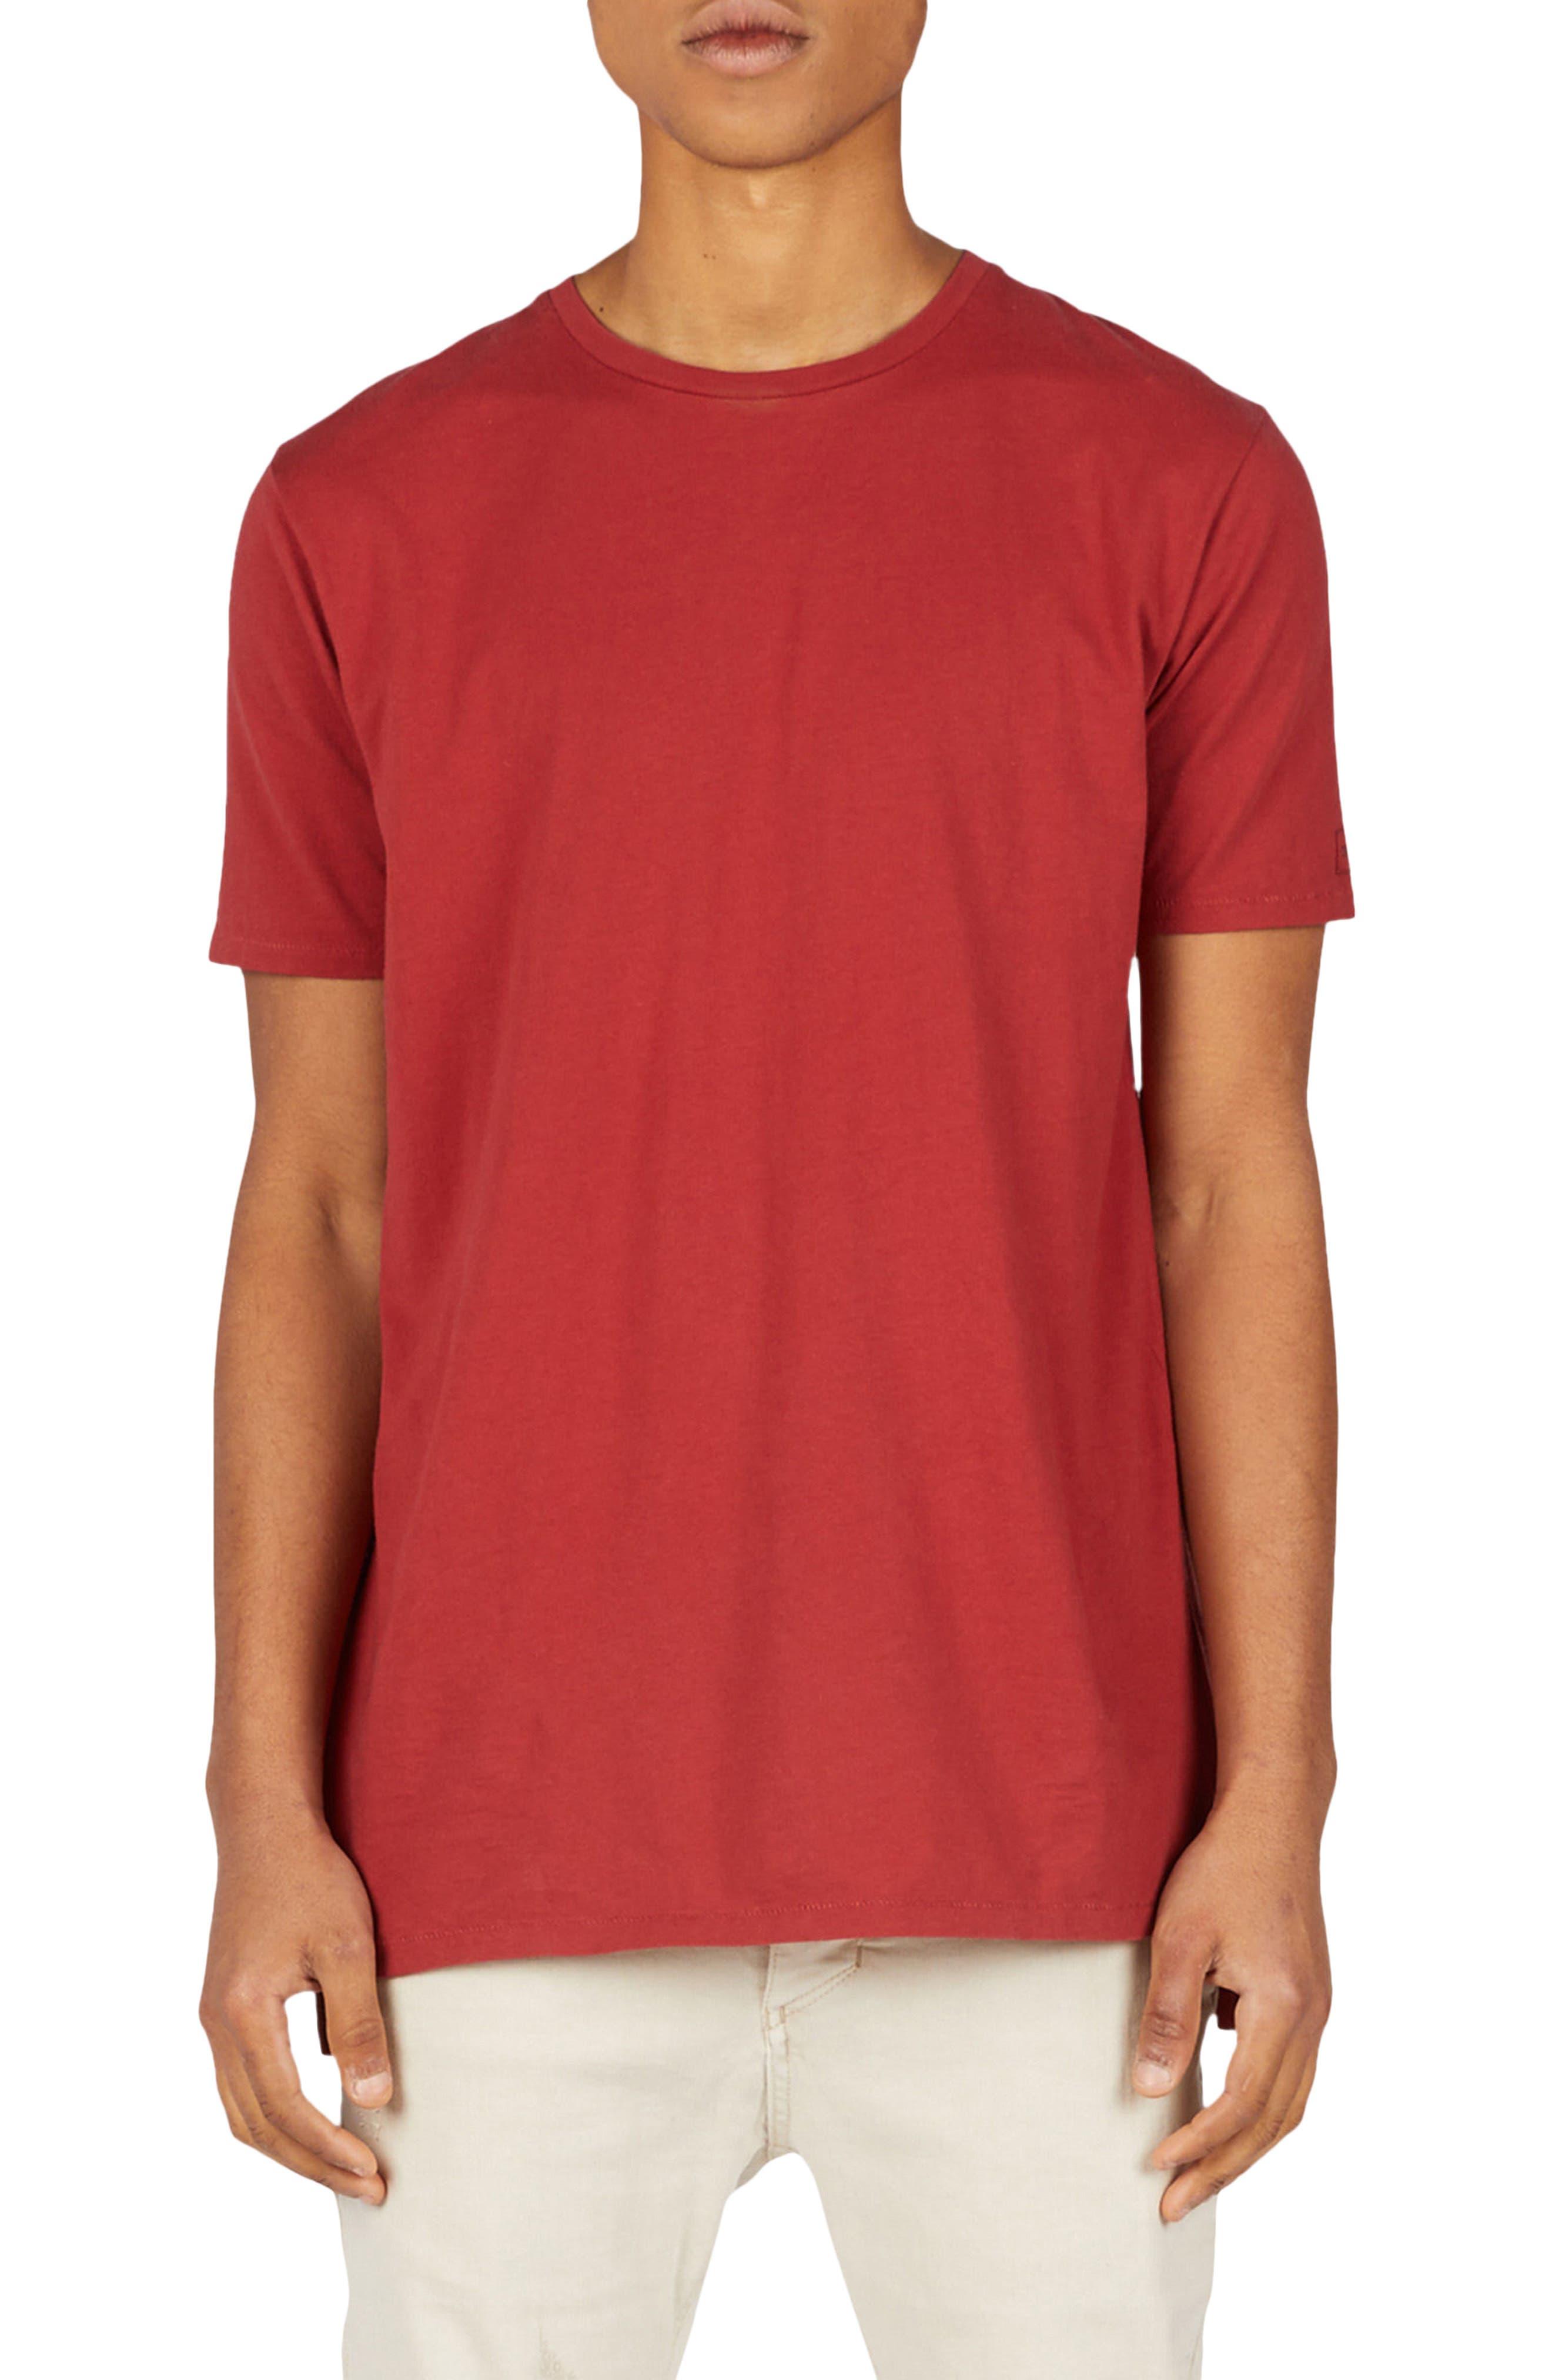 Flintlock T-Shirt,                             Main thumbnail 1, color,                             601